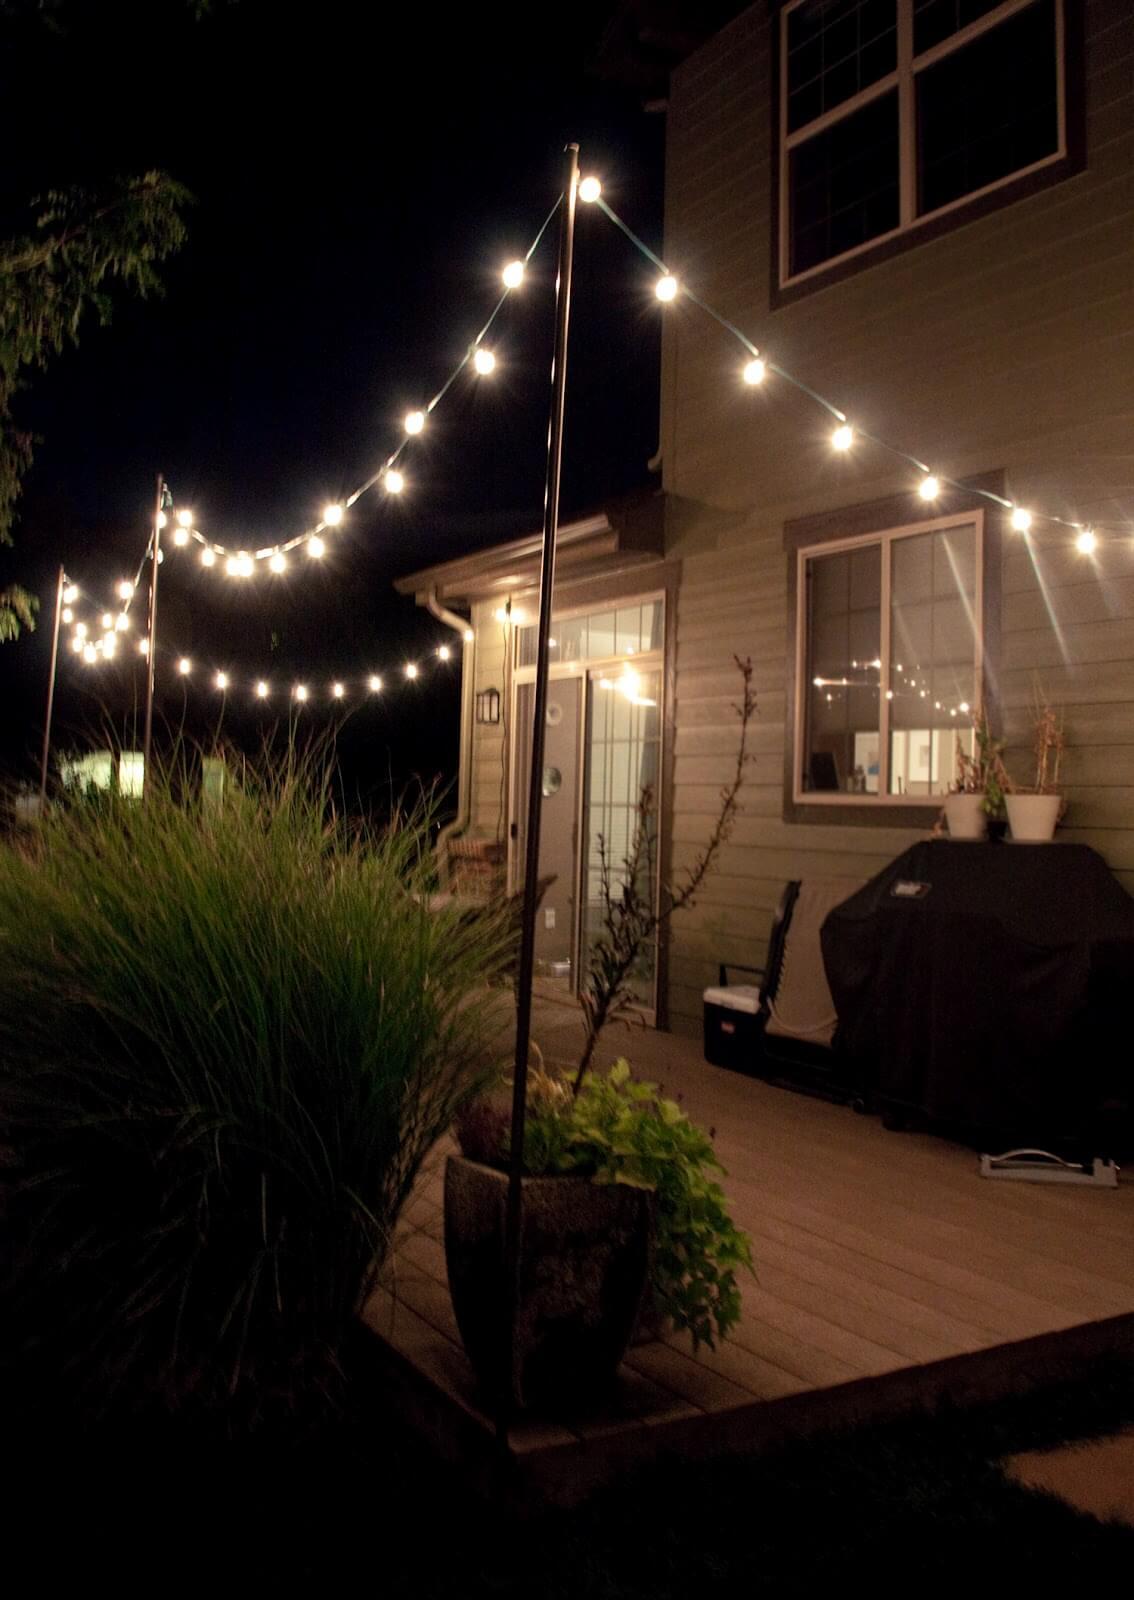 backyard lighting ideas year-round backyard deck string lights FZYOIUU